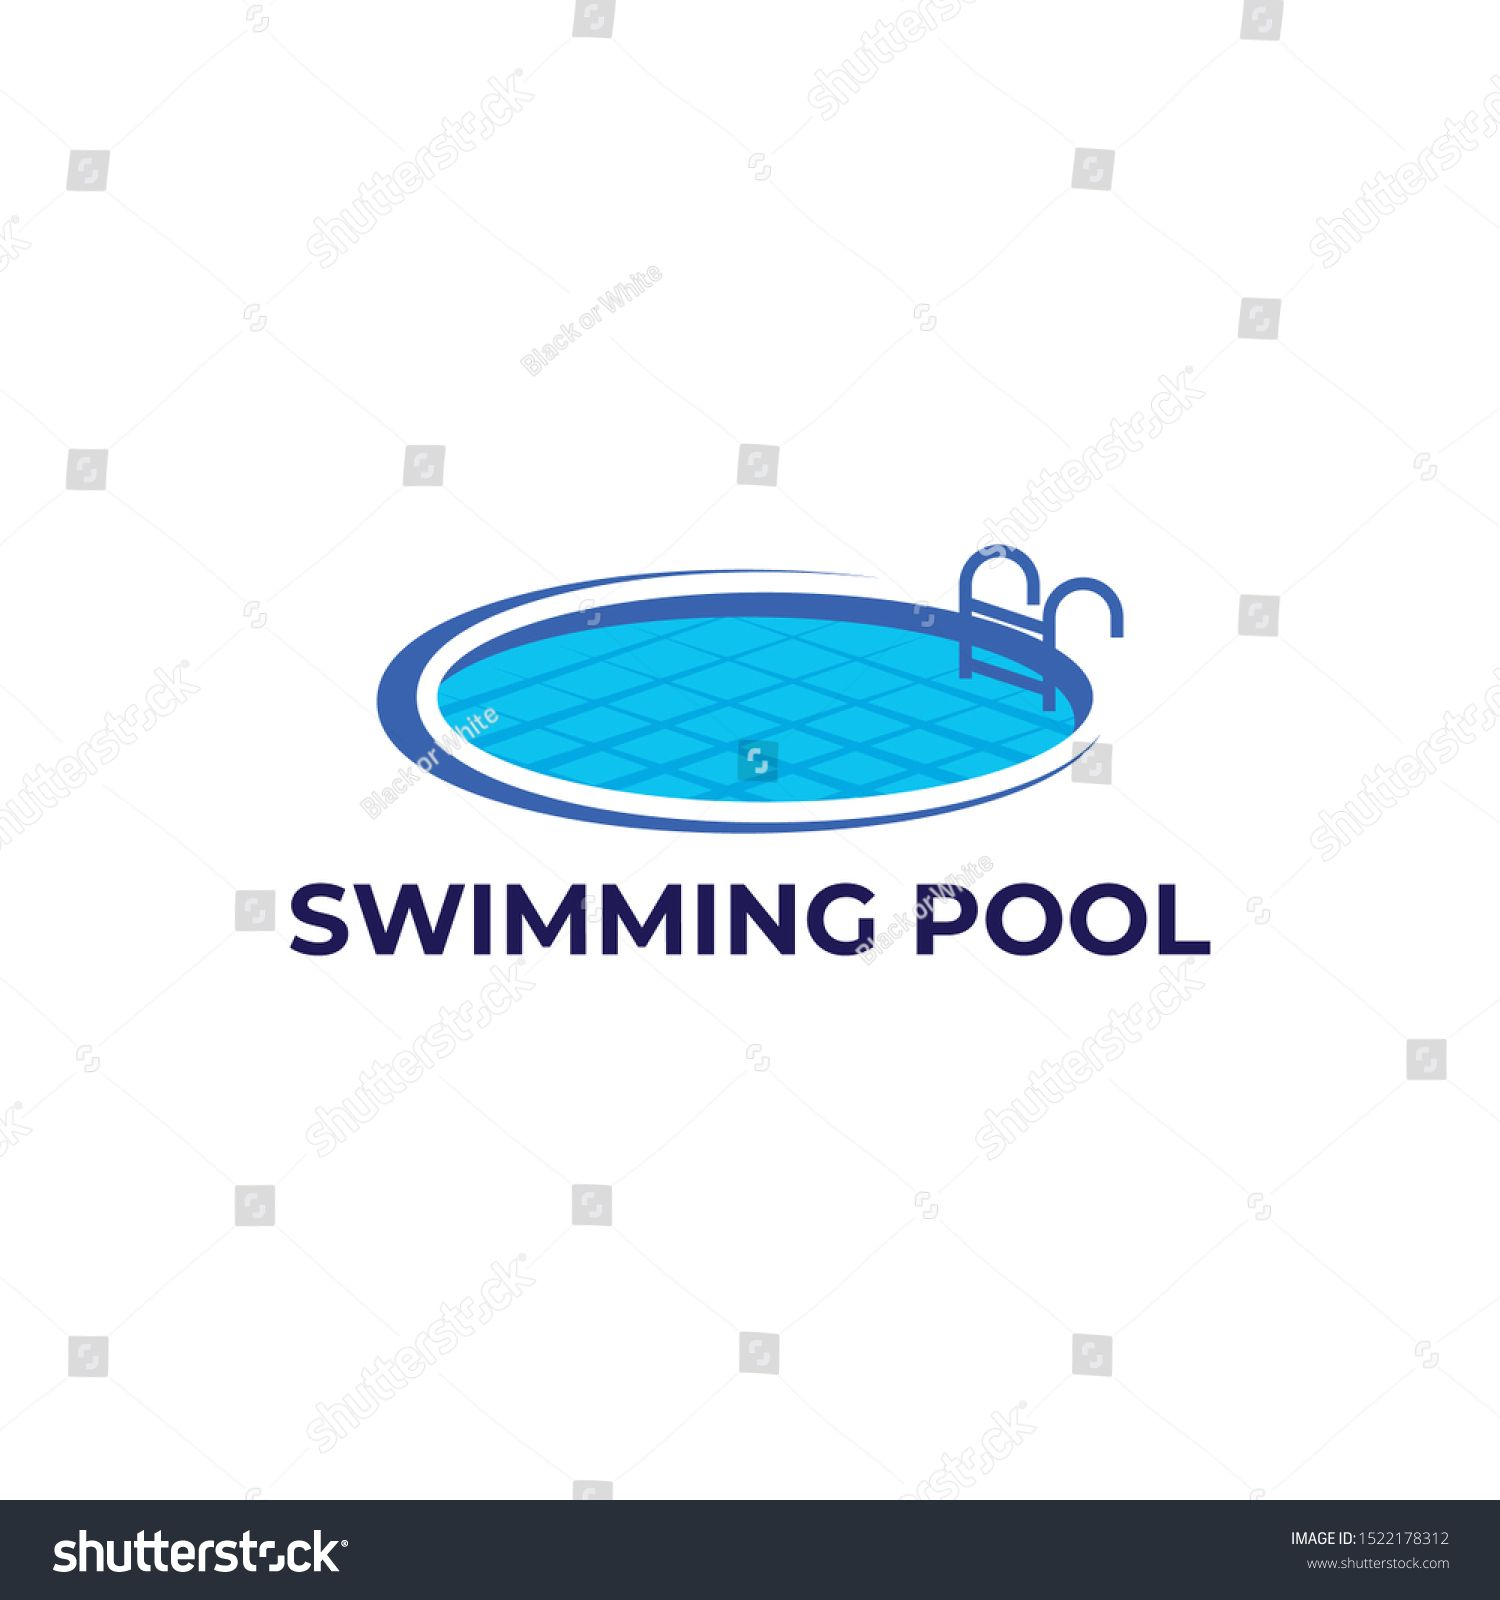 Swimming Pool Logo Design Vector Ad Sponsored Pool Swimming Logo Vector Logo Design Swimming Pools Pool Designs